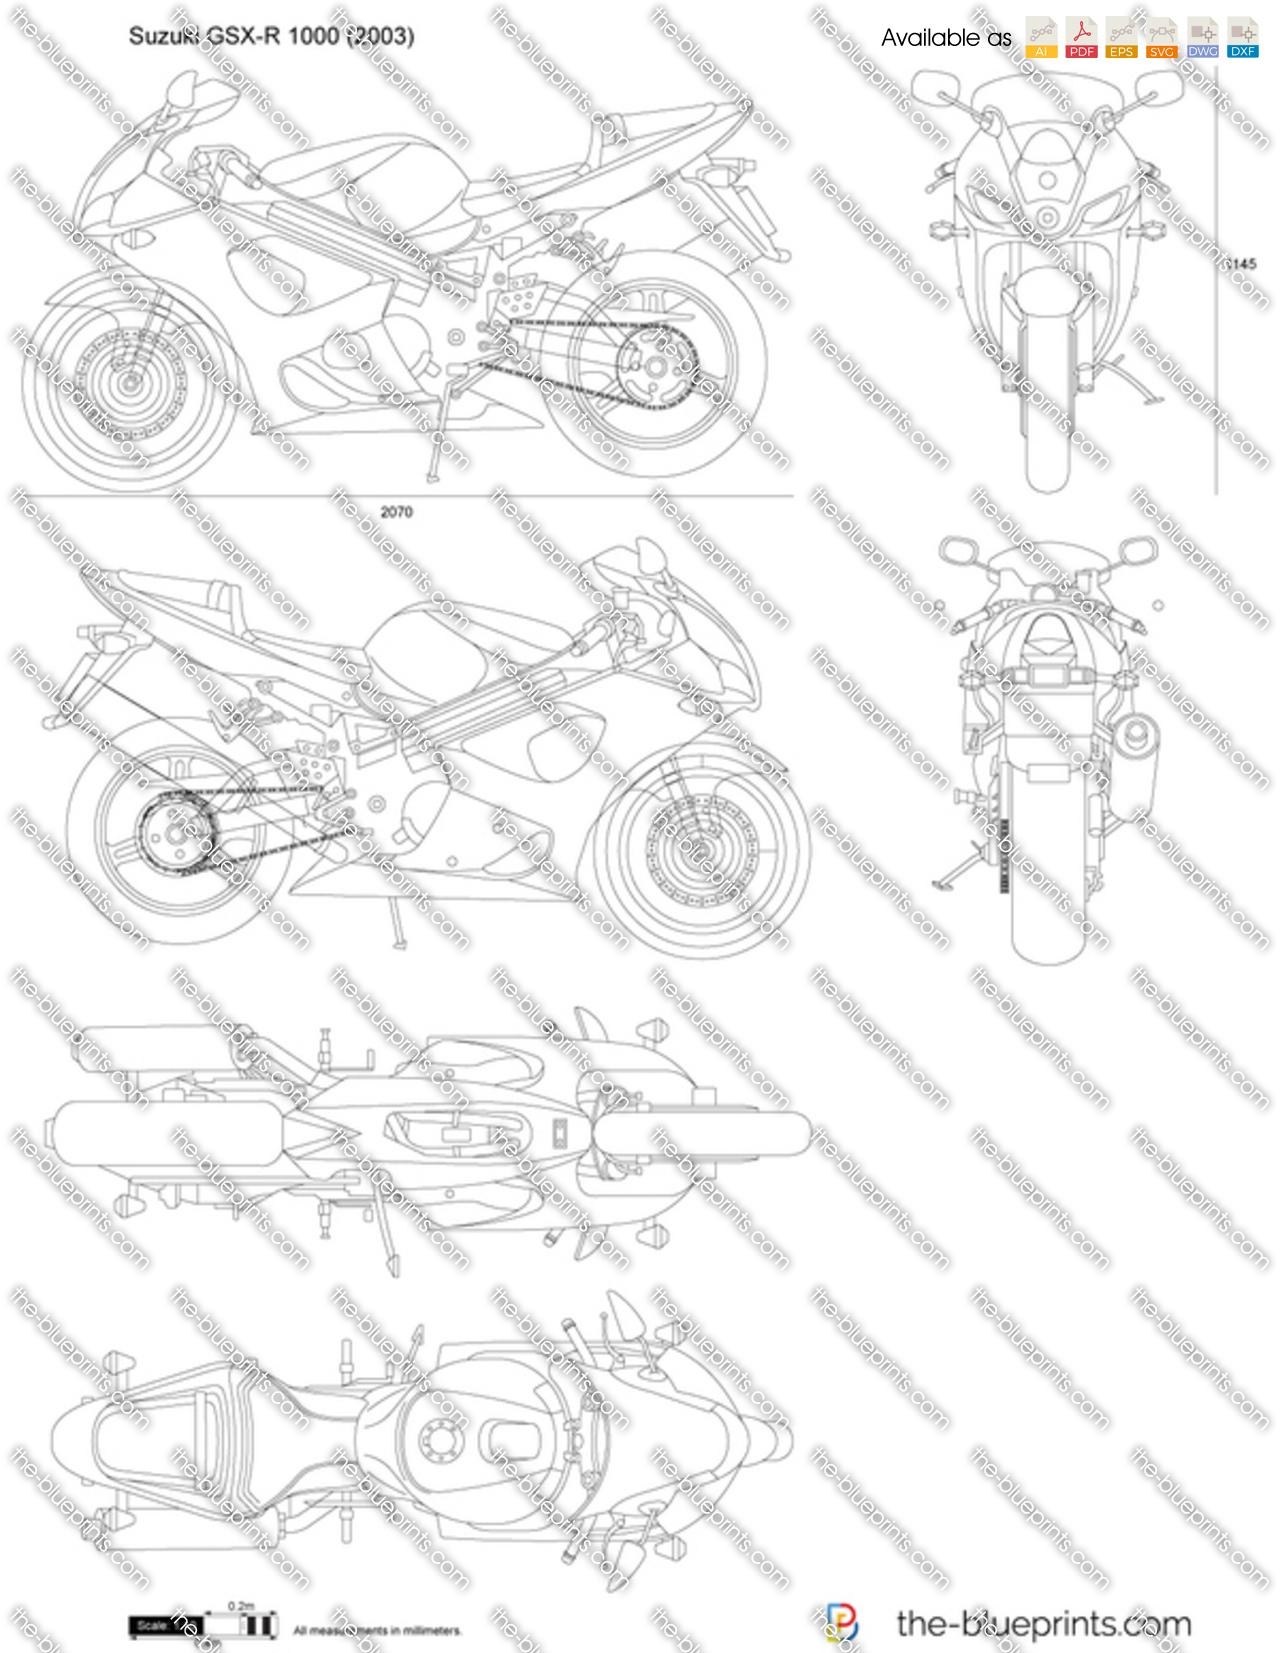 Suzuki GSX-R 1000 vector drawing